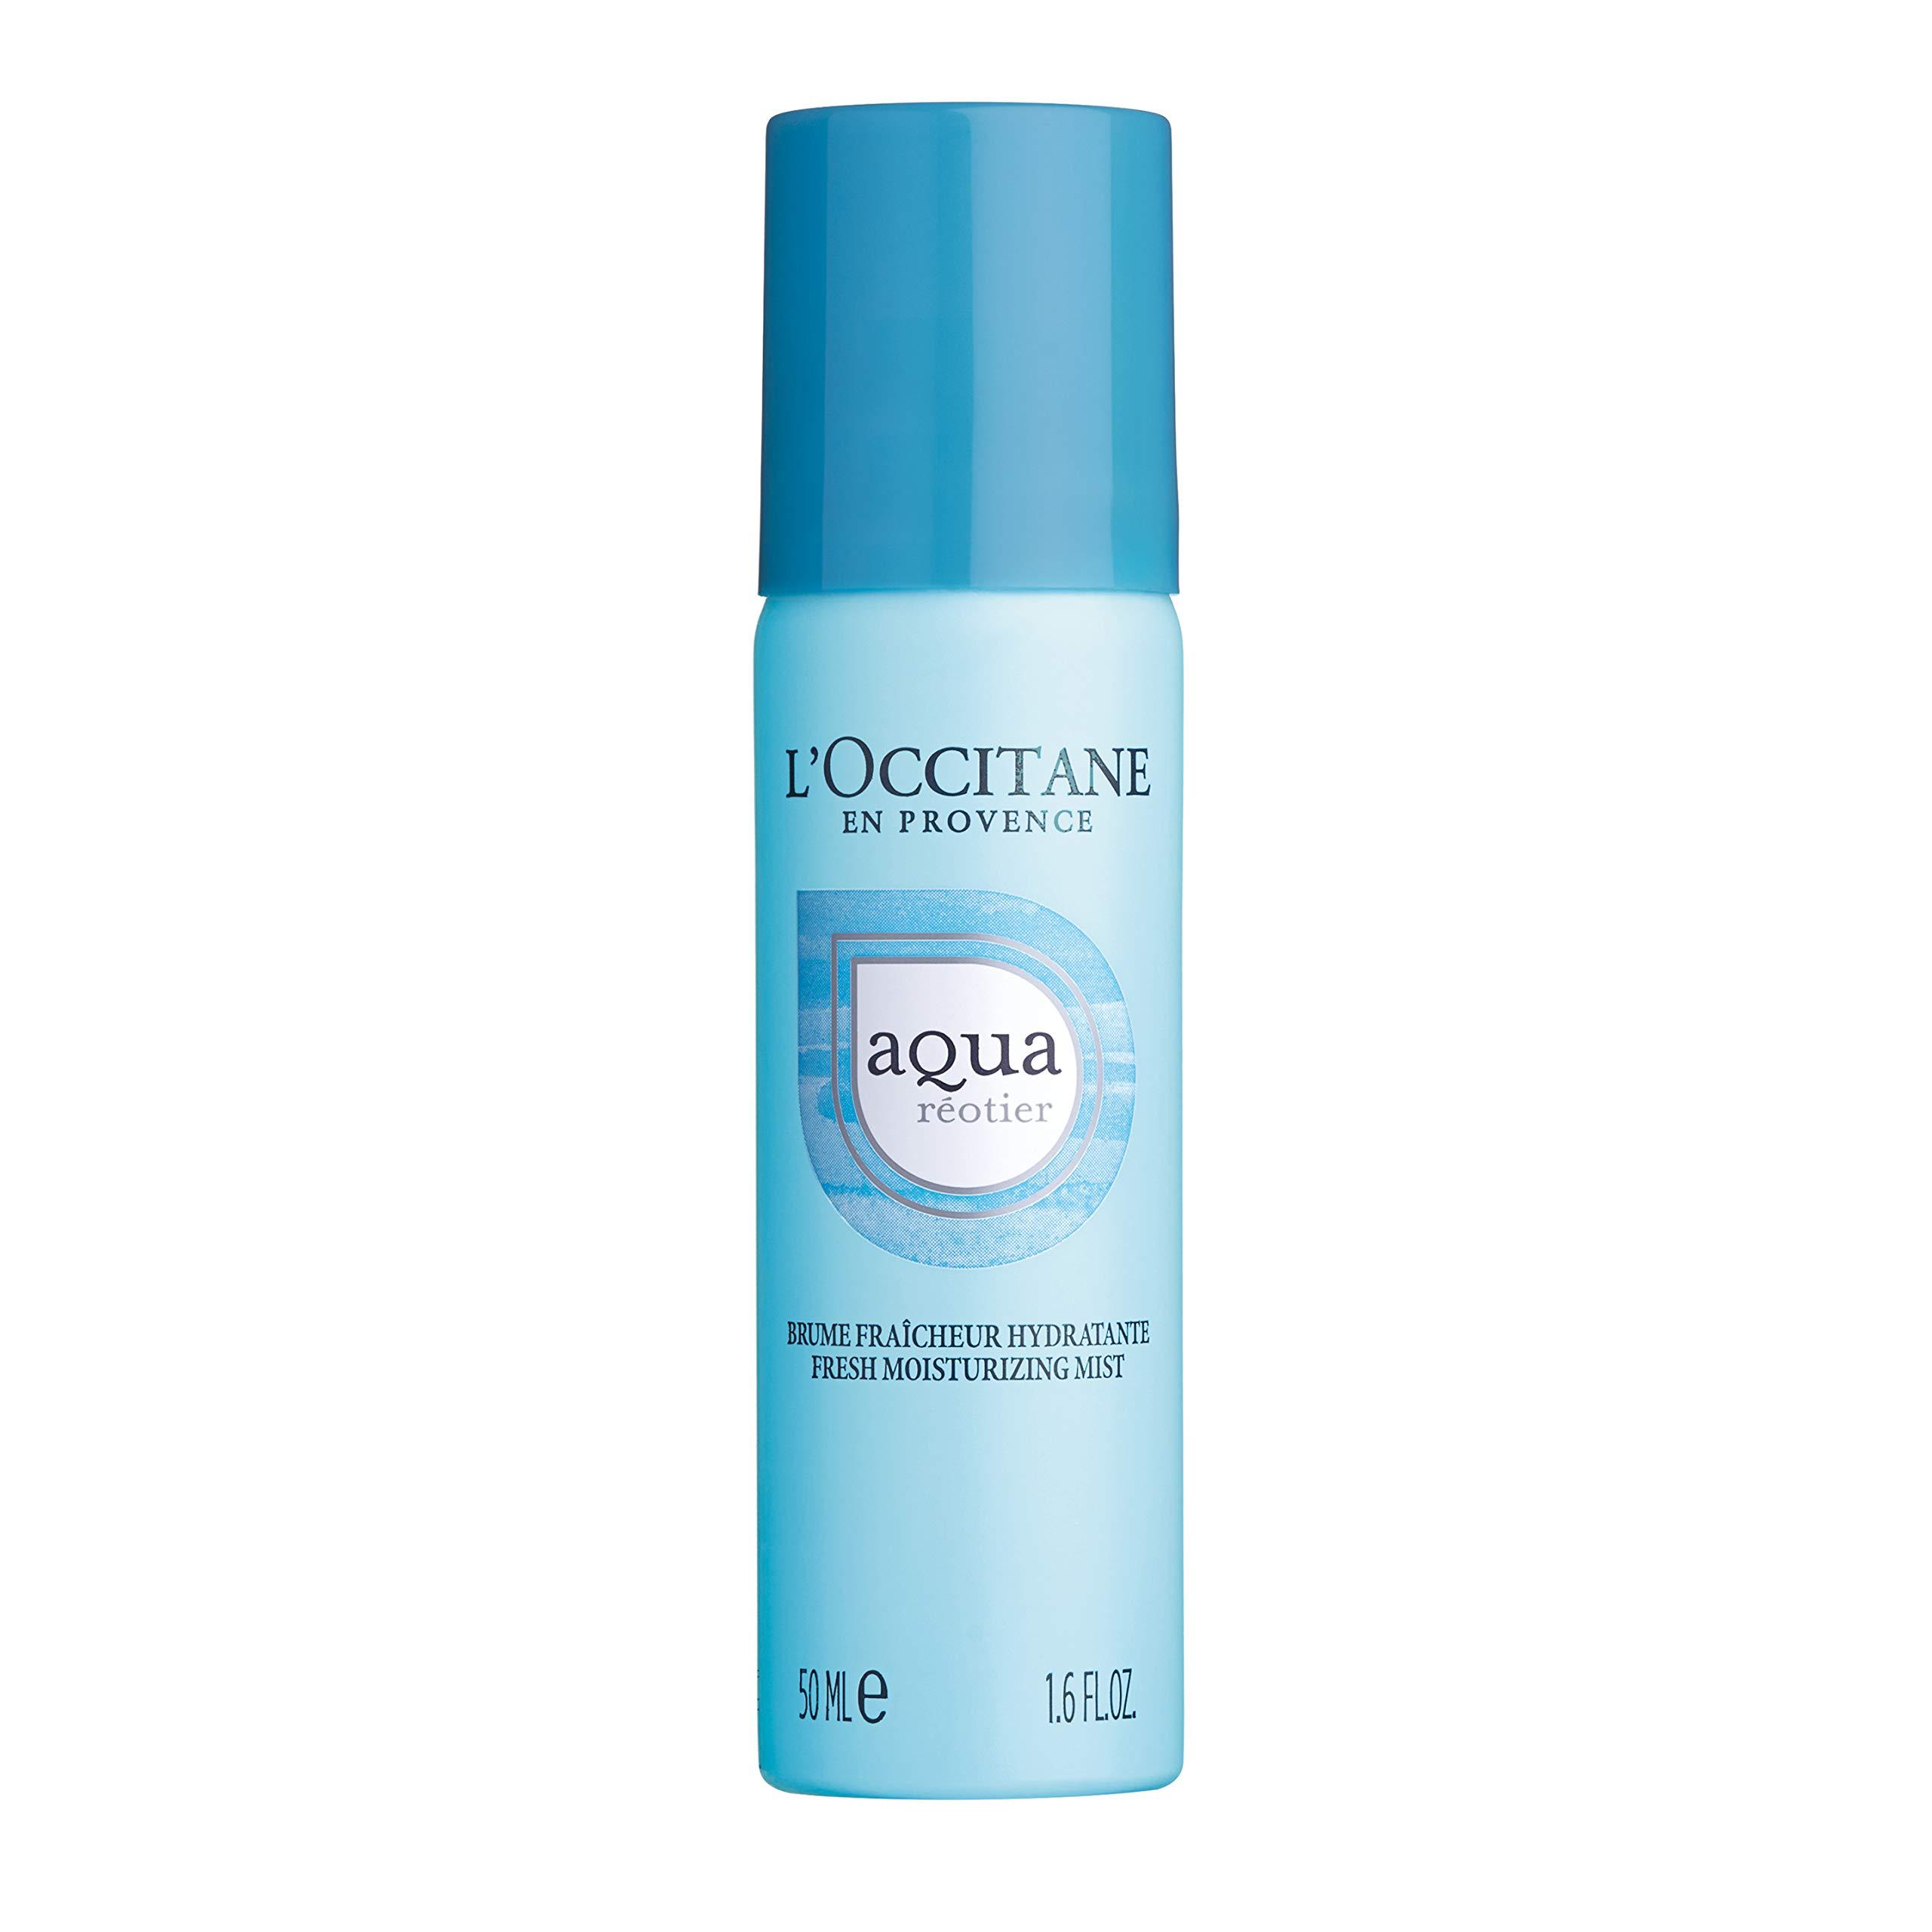 L'Occitane Hydrating Water-Based Aqua Reotier Fresh Moisturizing Mist Enriched with Hyaluronic Acid, 1.6 fl. oz.